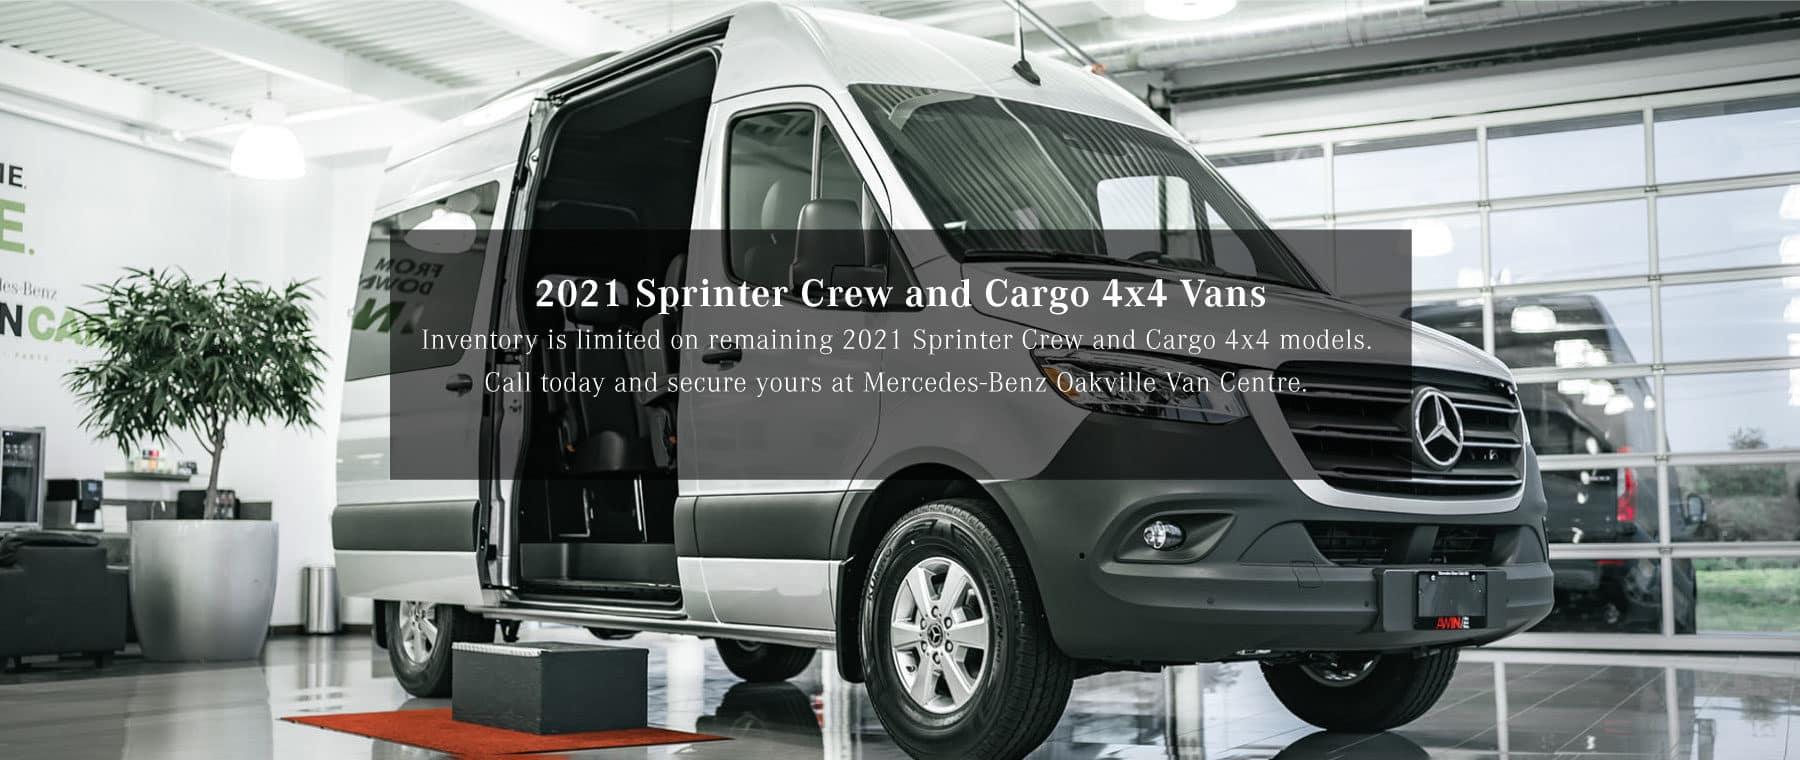 2021-Sprinter